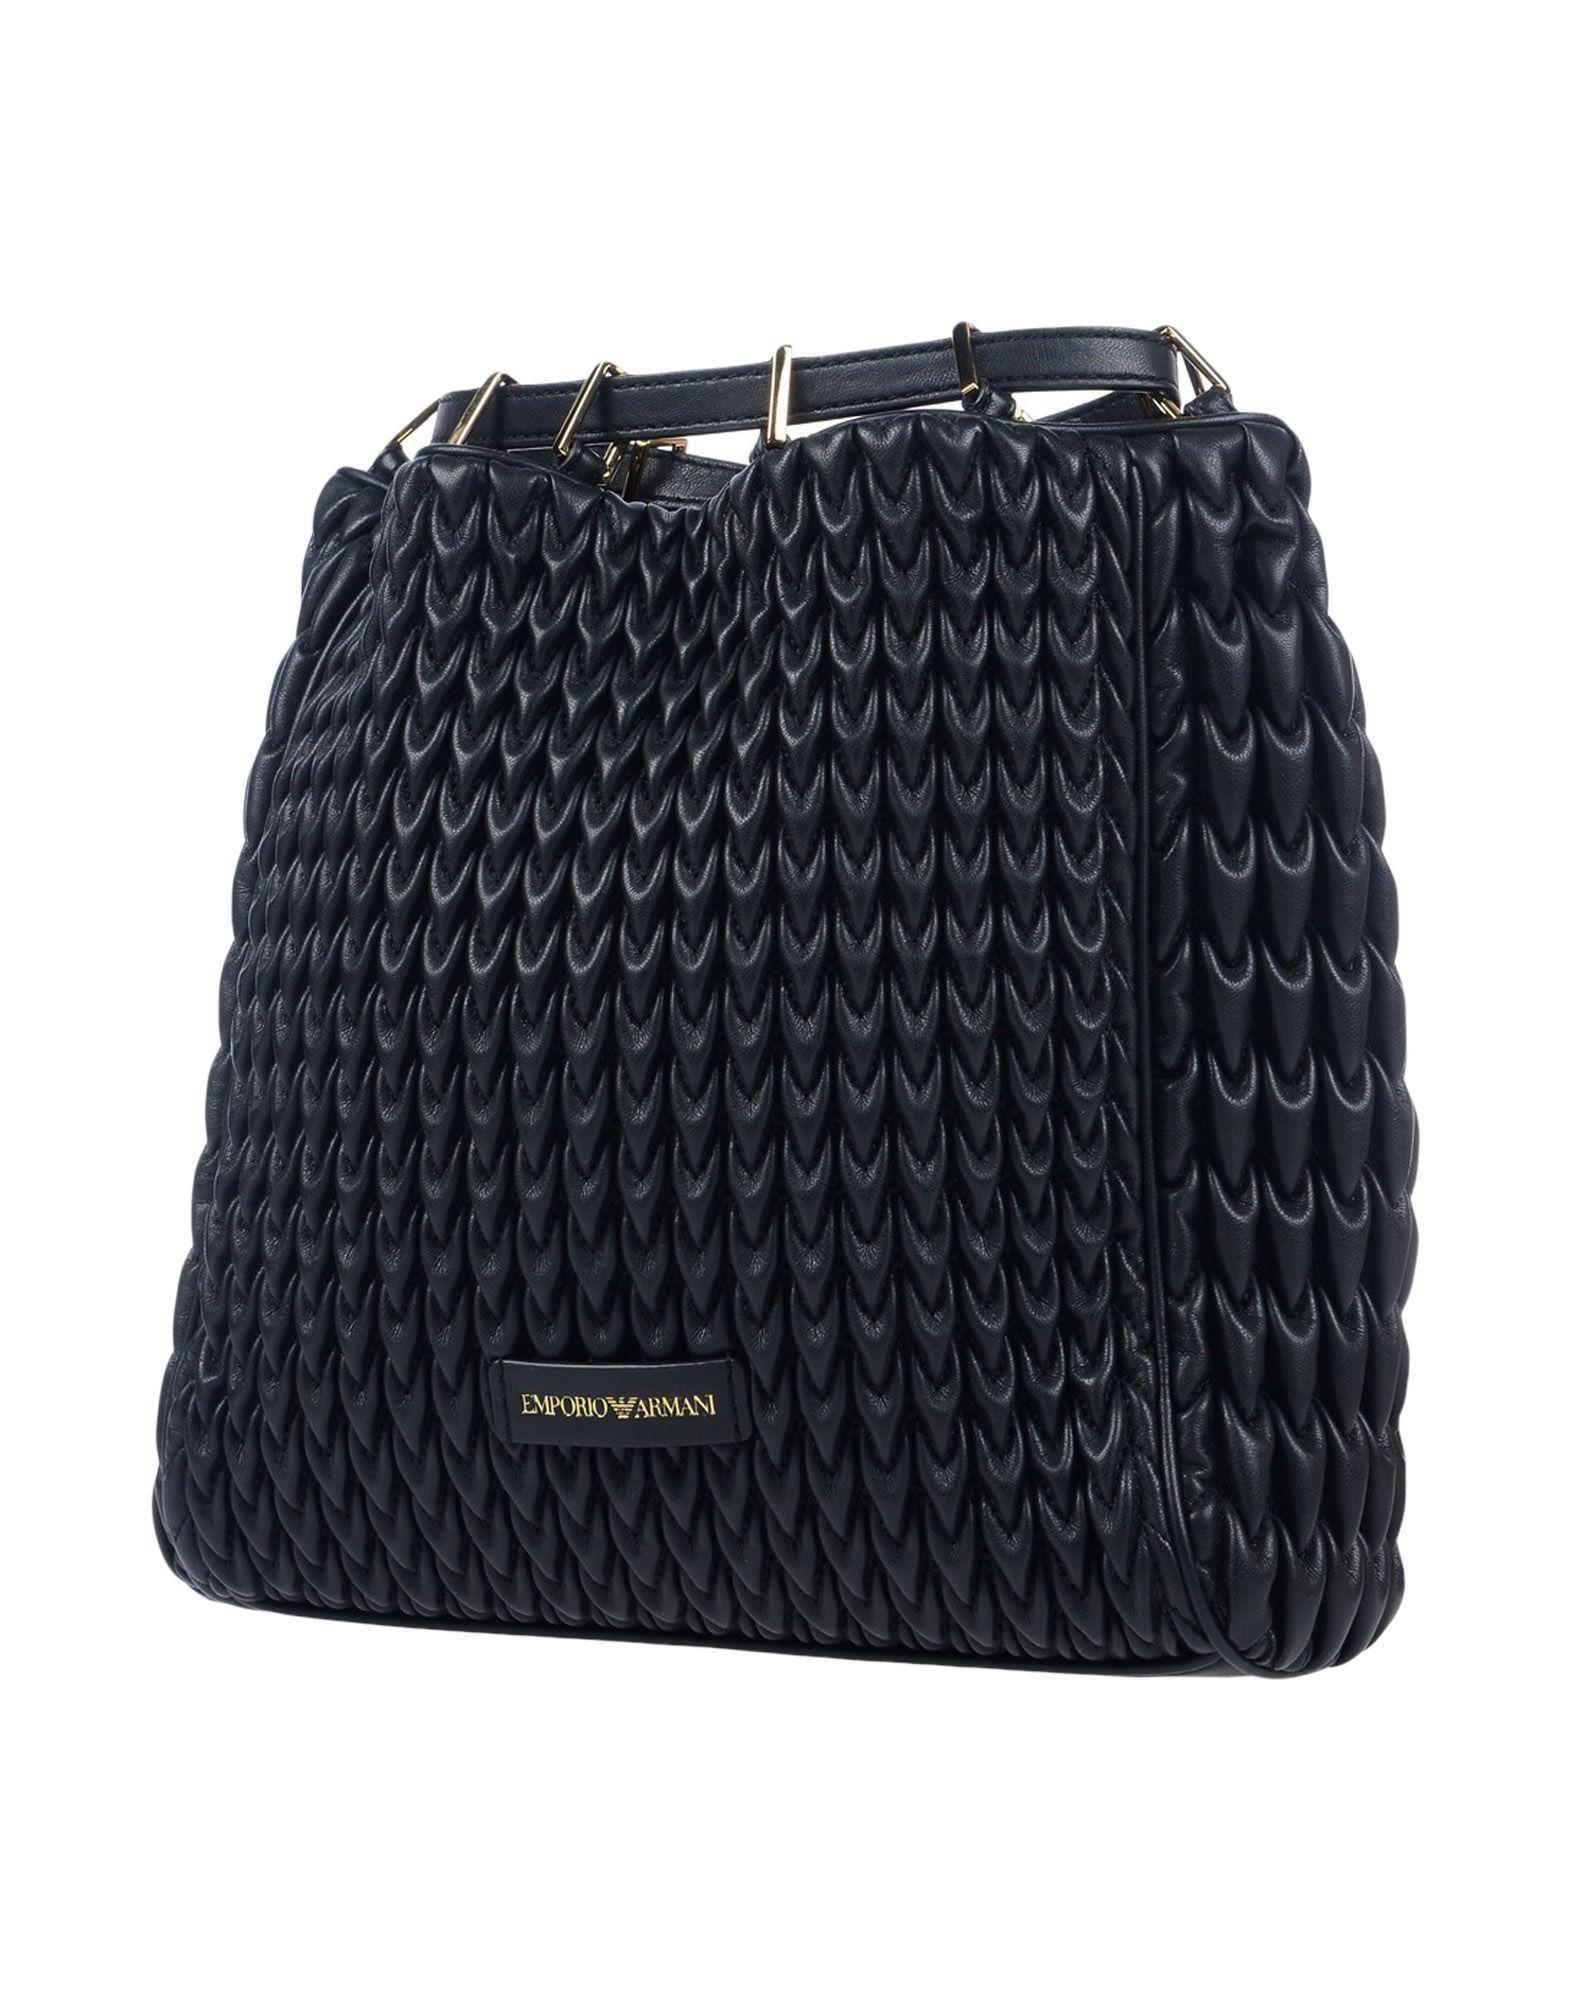 Emporio Armani - Black Backpacks   Bum Bags - Lyst. View fullscreen 3bc801286b4d5